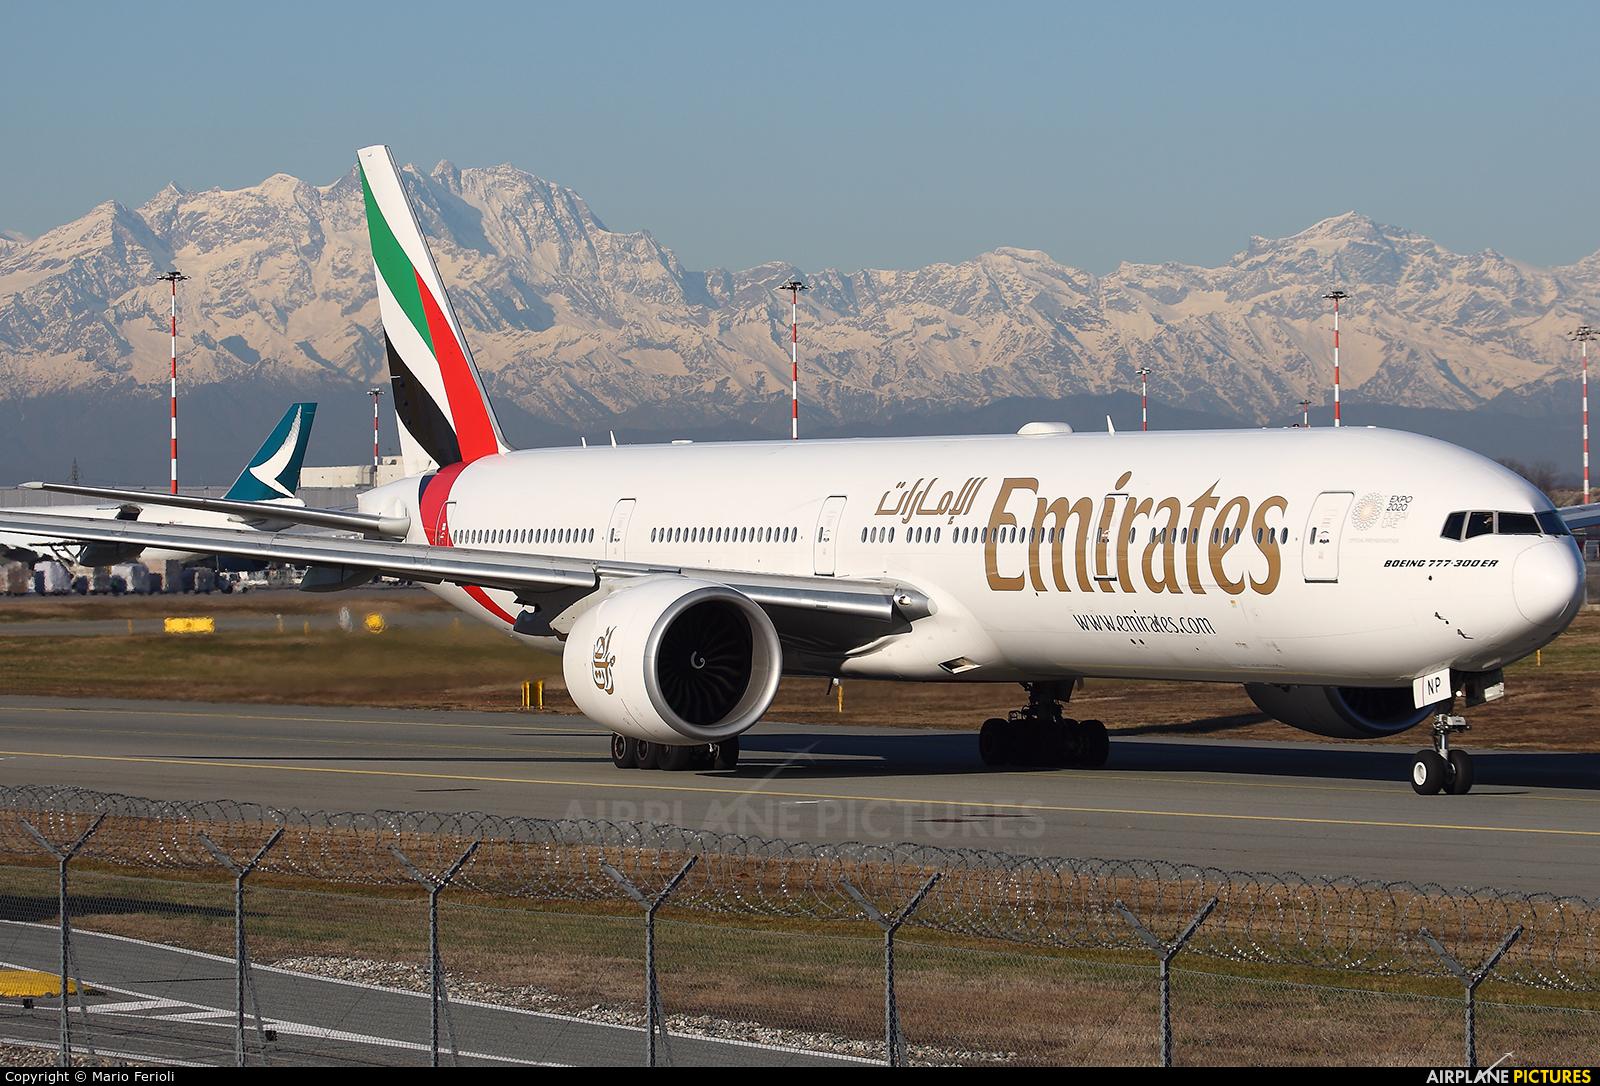 Emirates Airlines A6-ENP aircraft at Milan - Malpensa